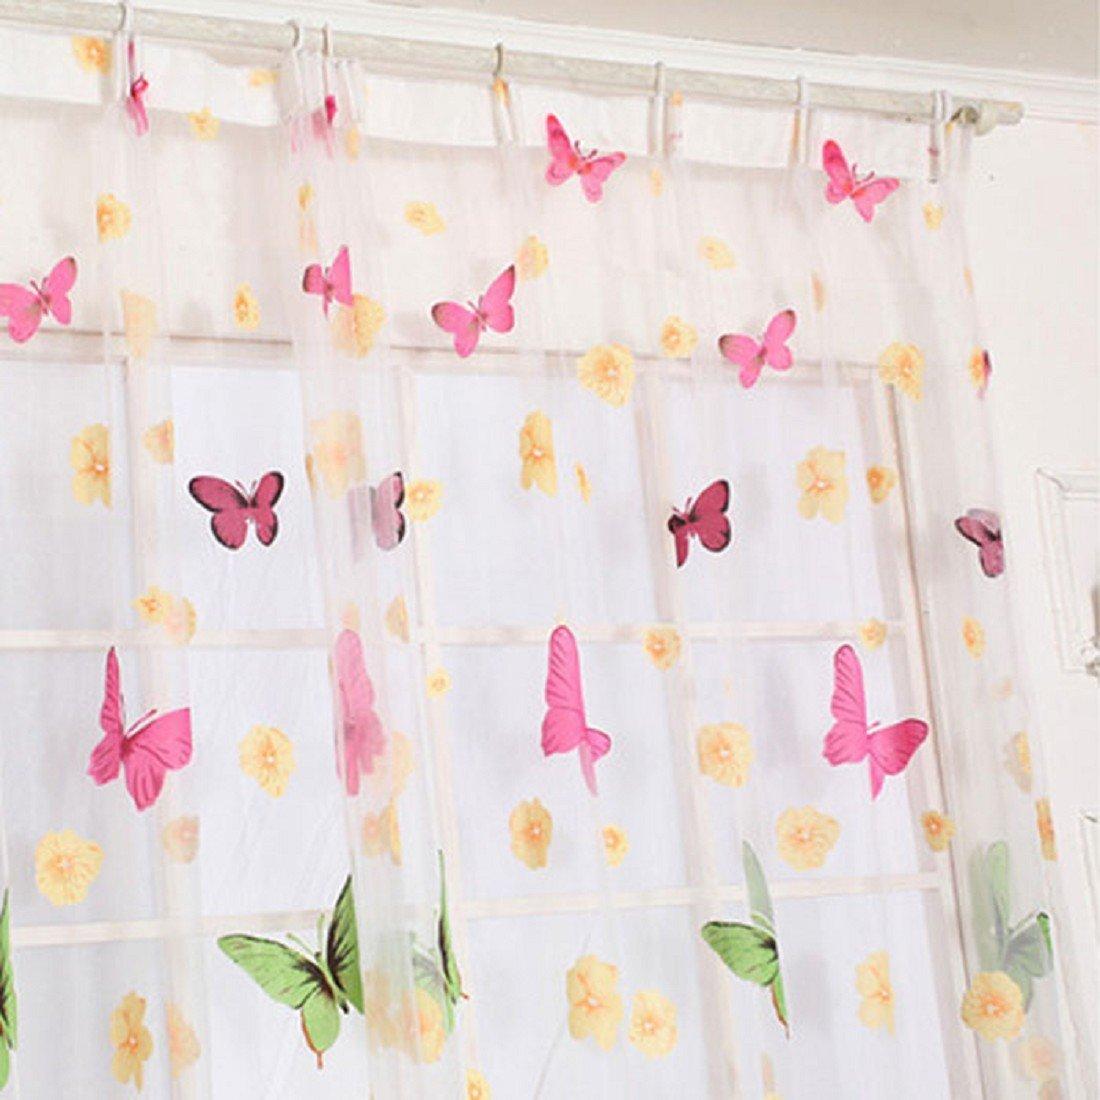 tongshi butterfly print cortinas sheer para saln dormitorio chica